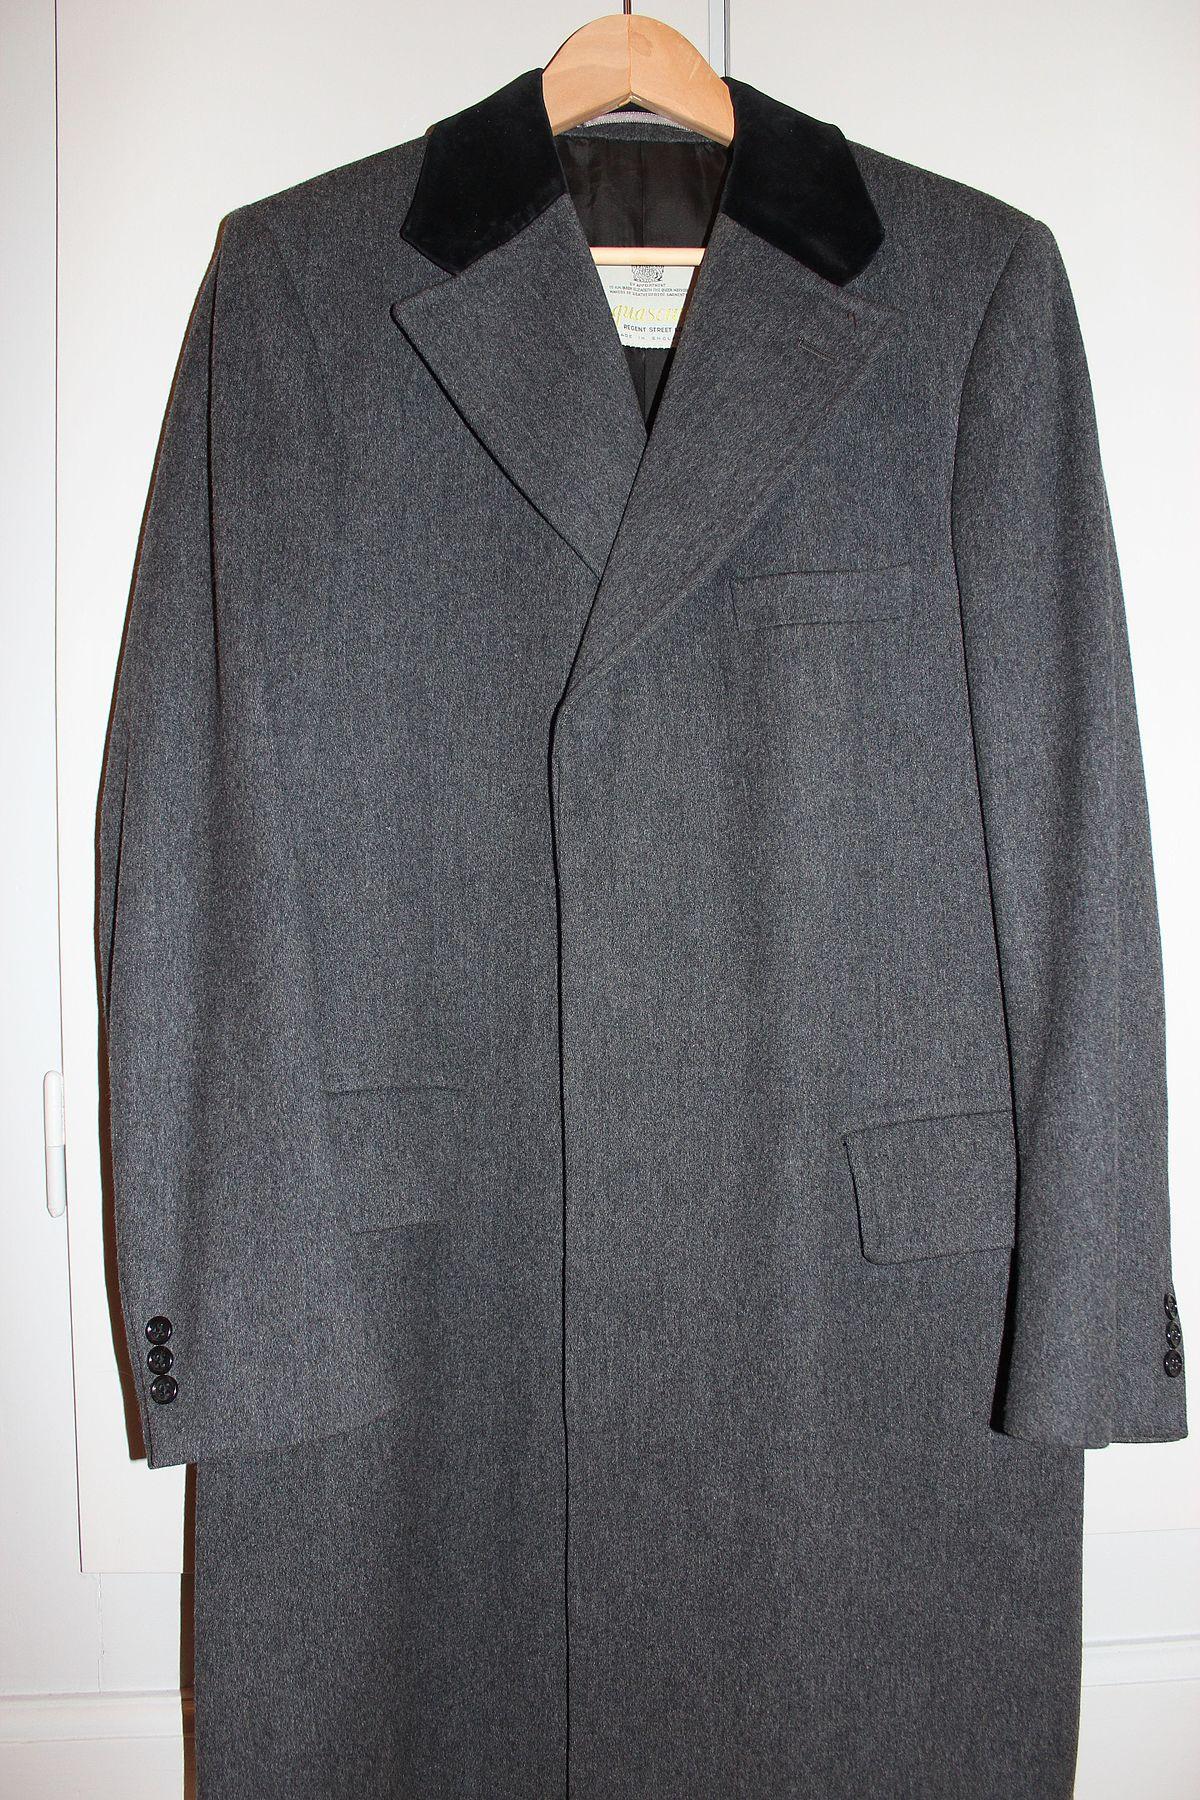 Covert coat  Wikipedia